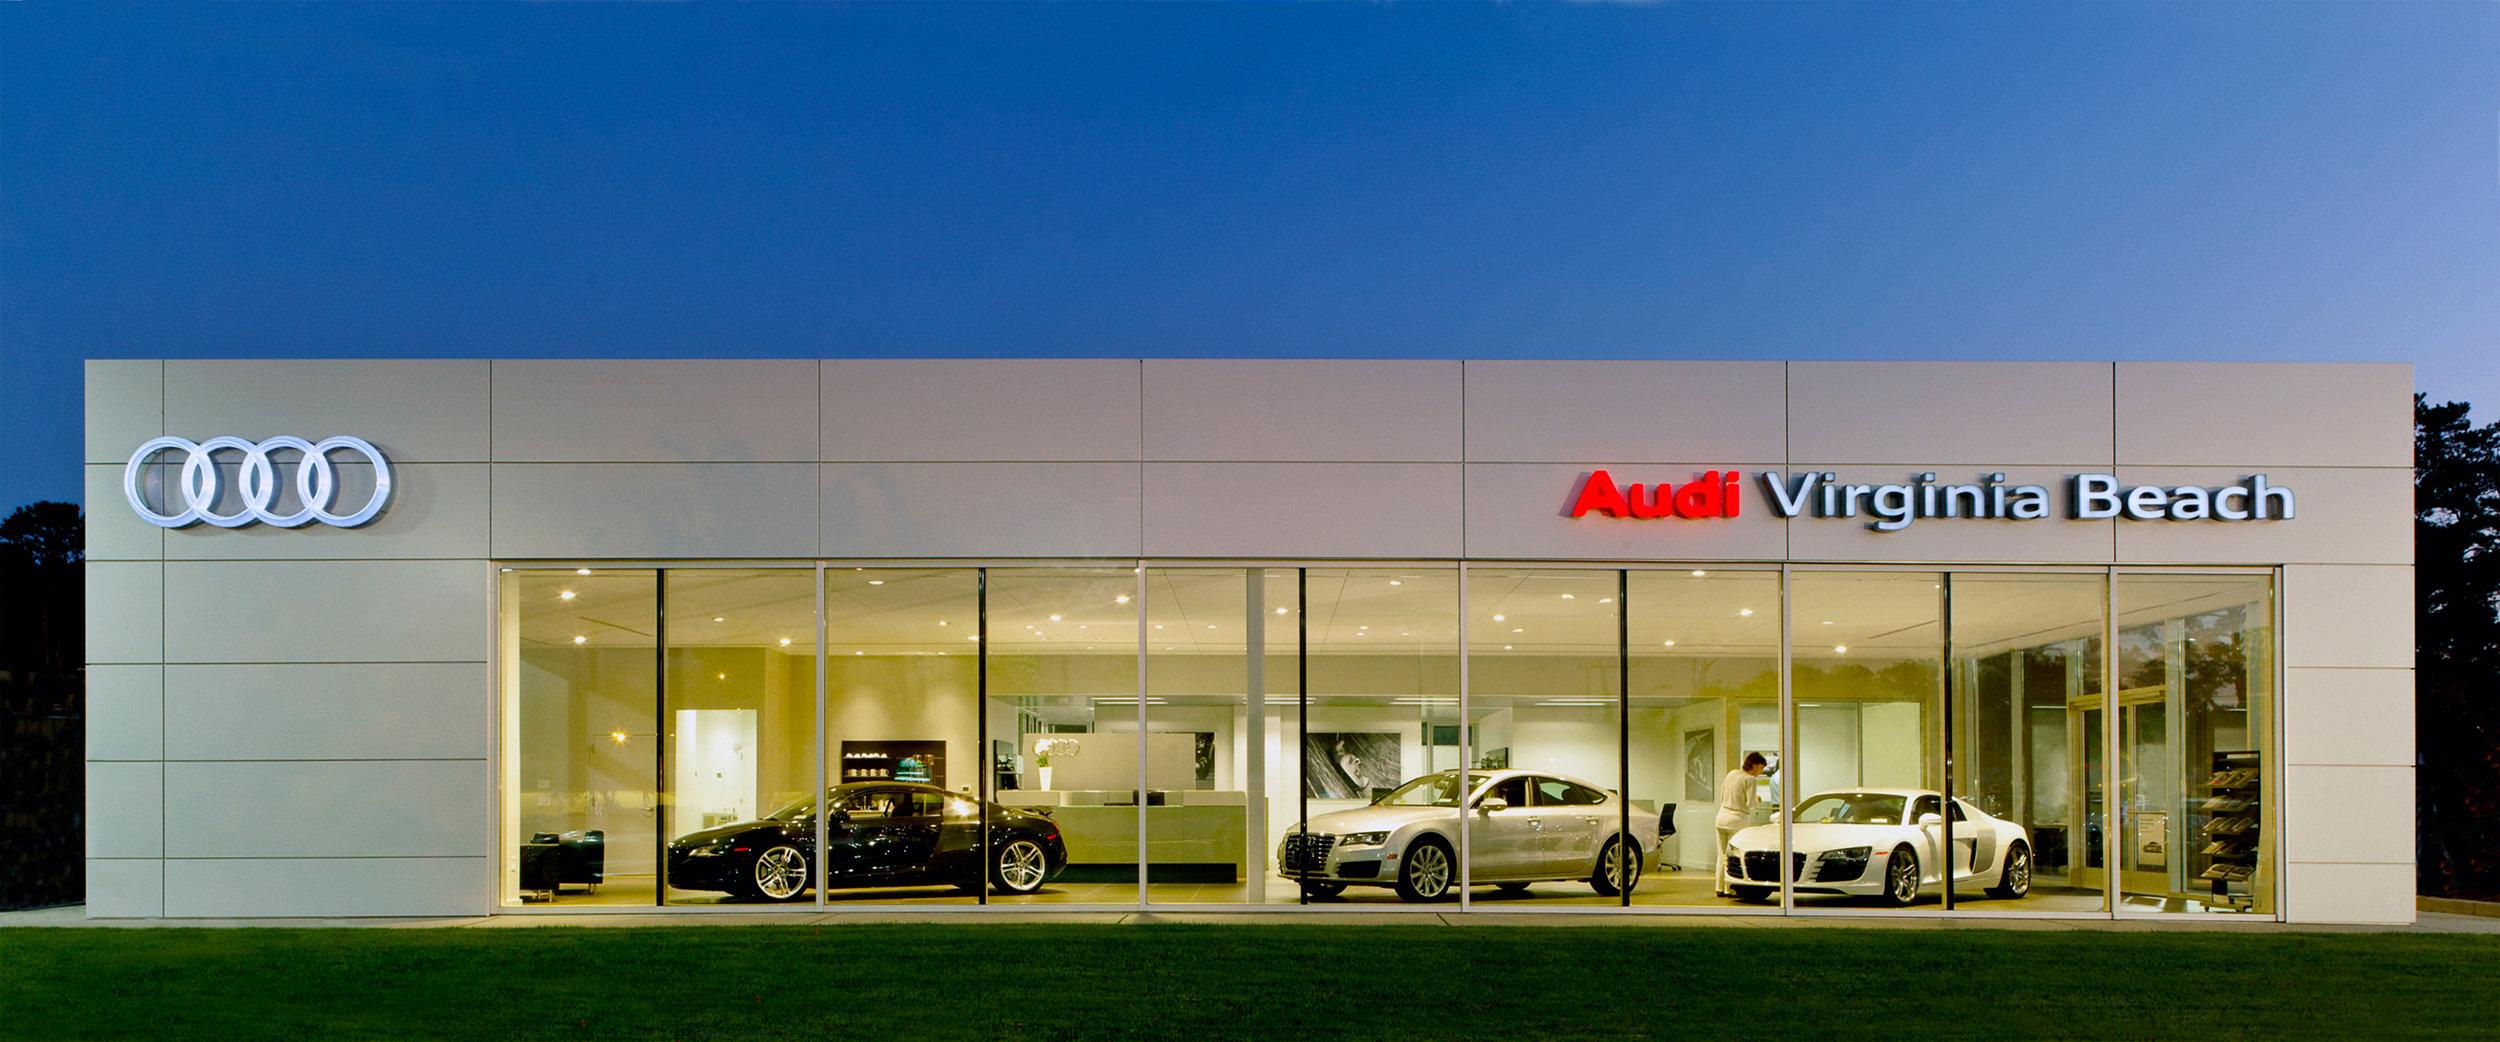 Audi Virginia Beach03.jpg